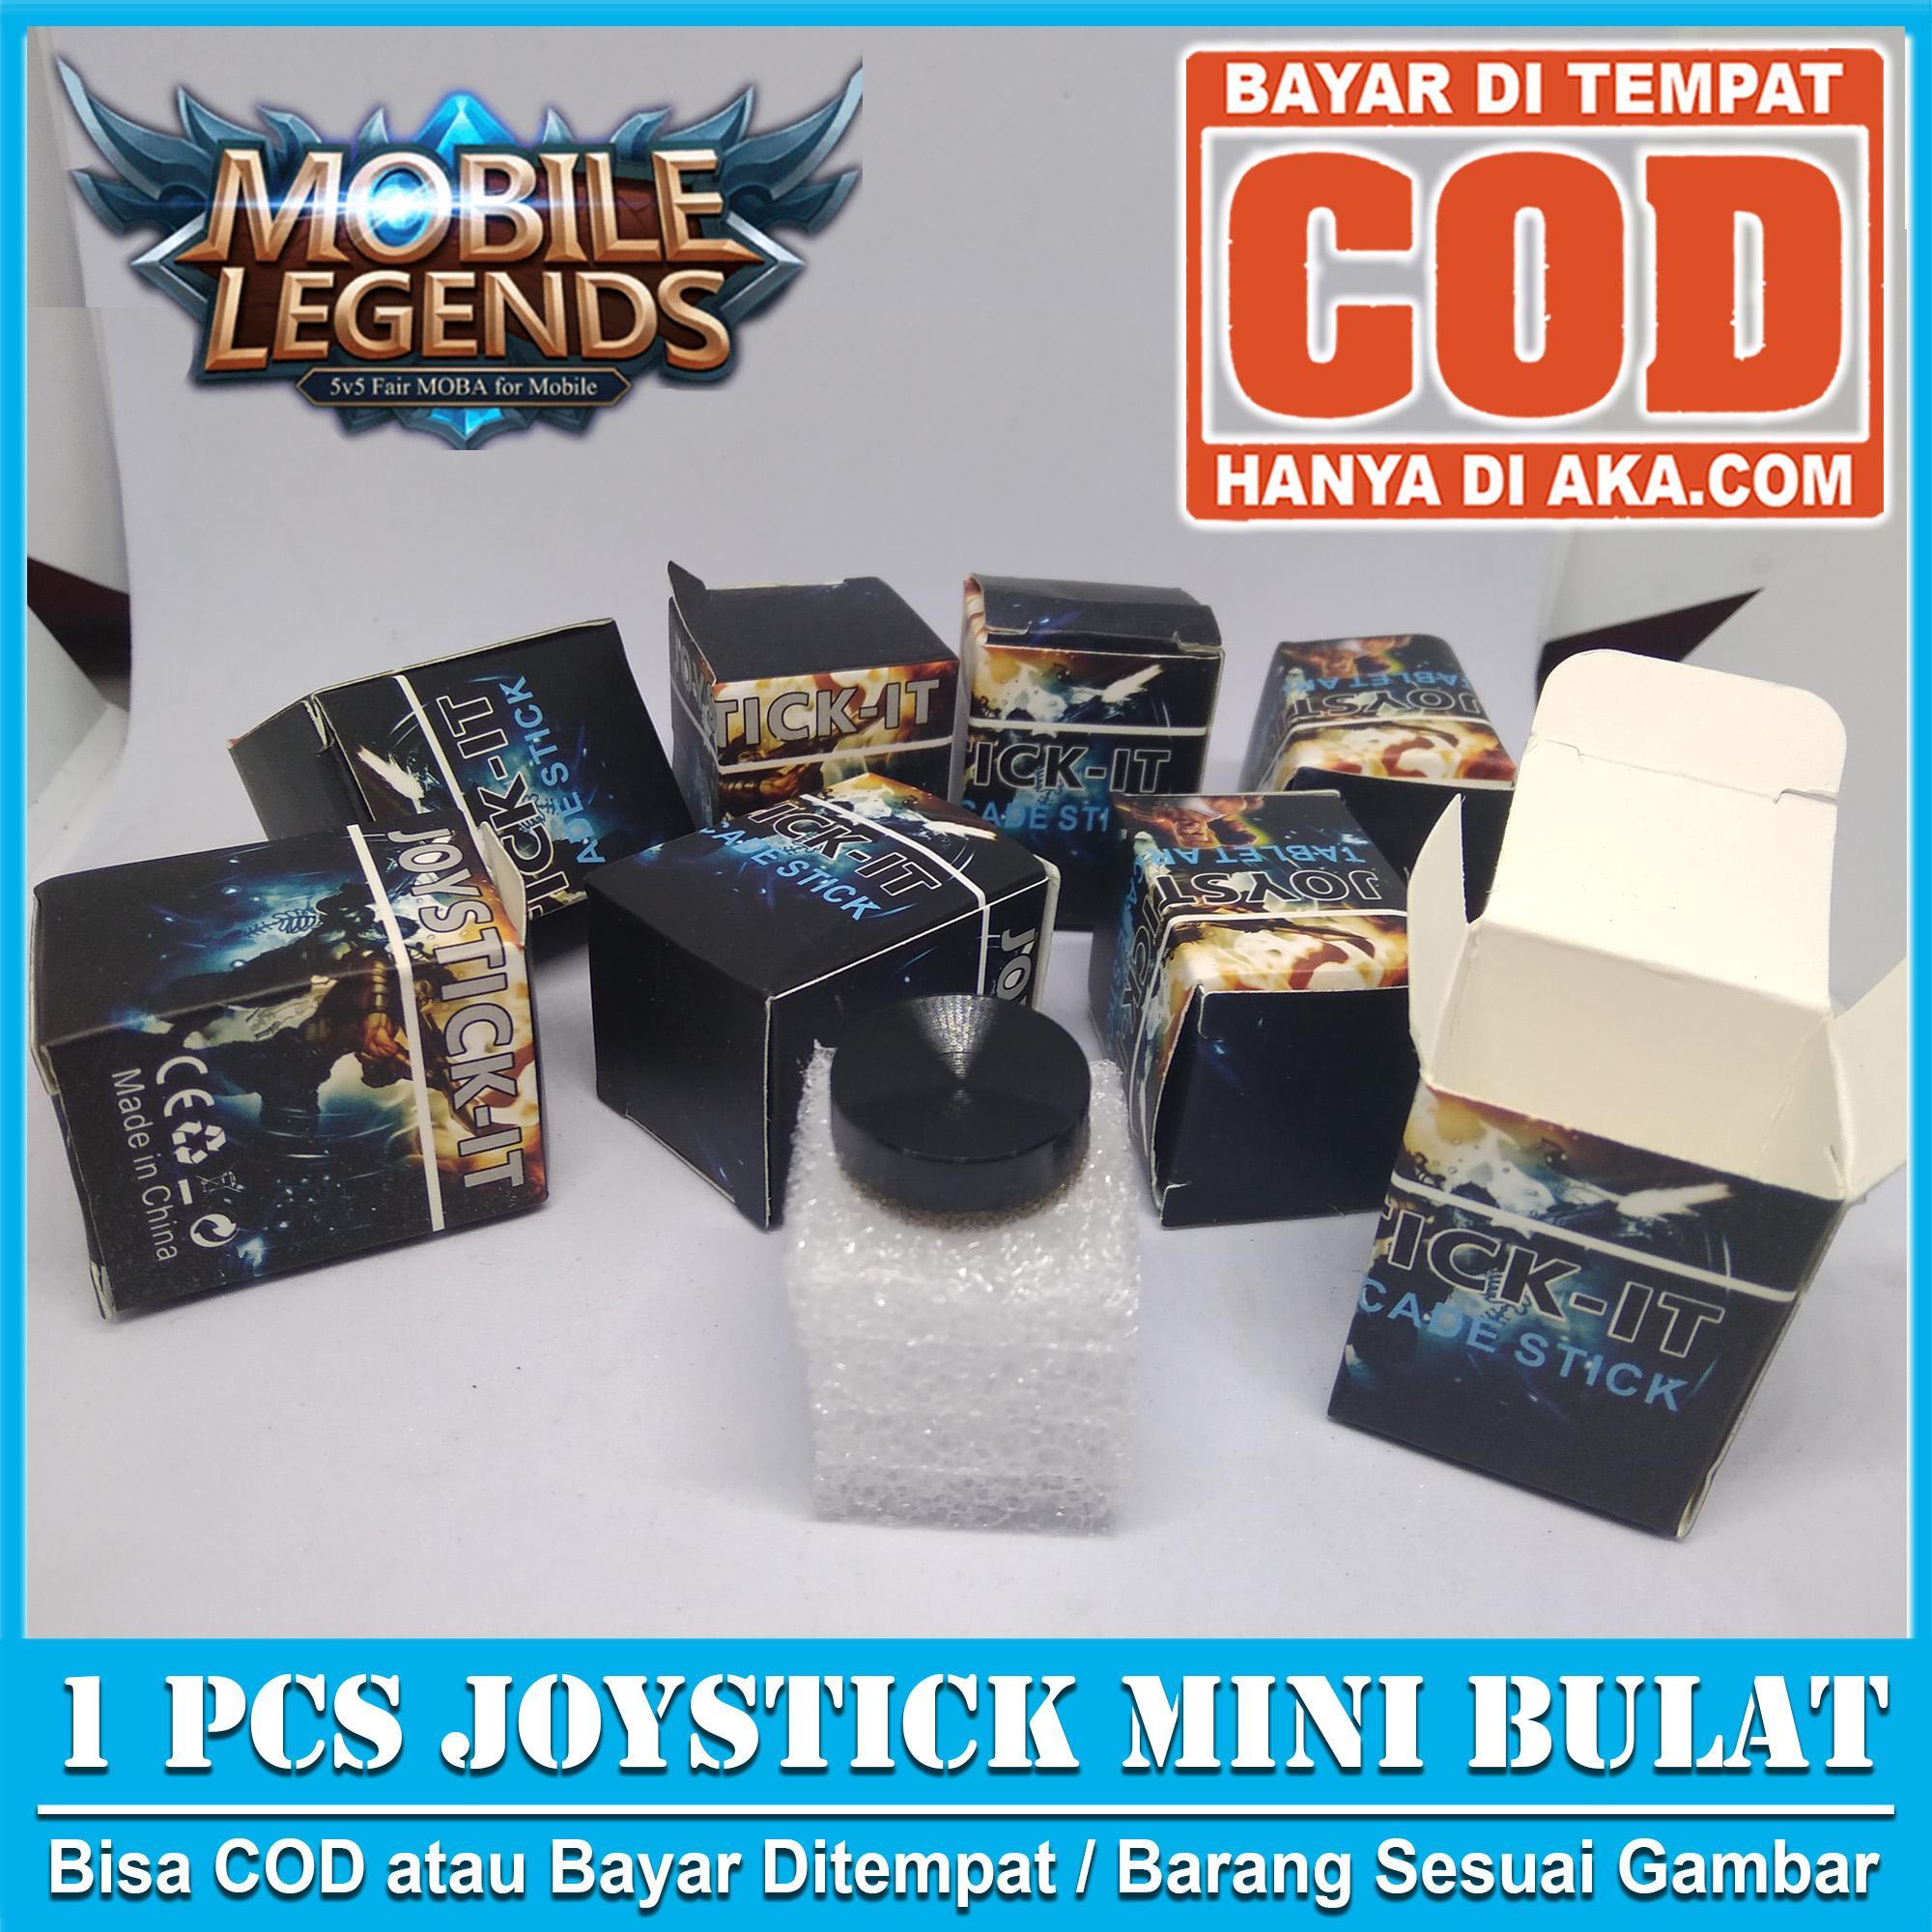 Joystick HP Mobile Joystik Bulat for Gaming Smartphone Premium Mobile Legend REAL PICTURE